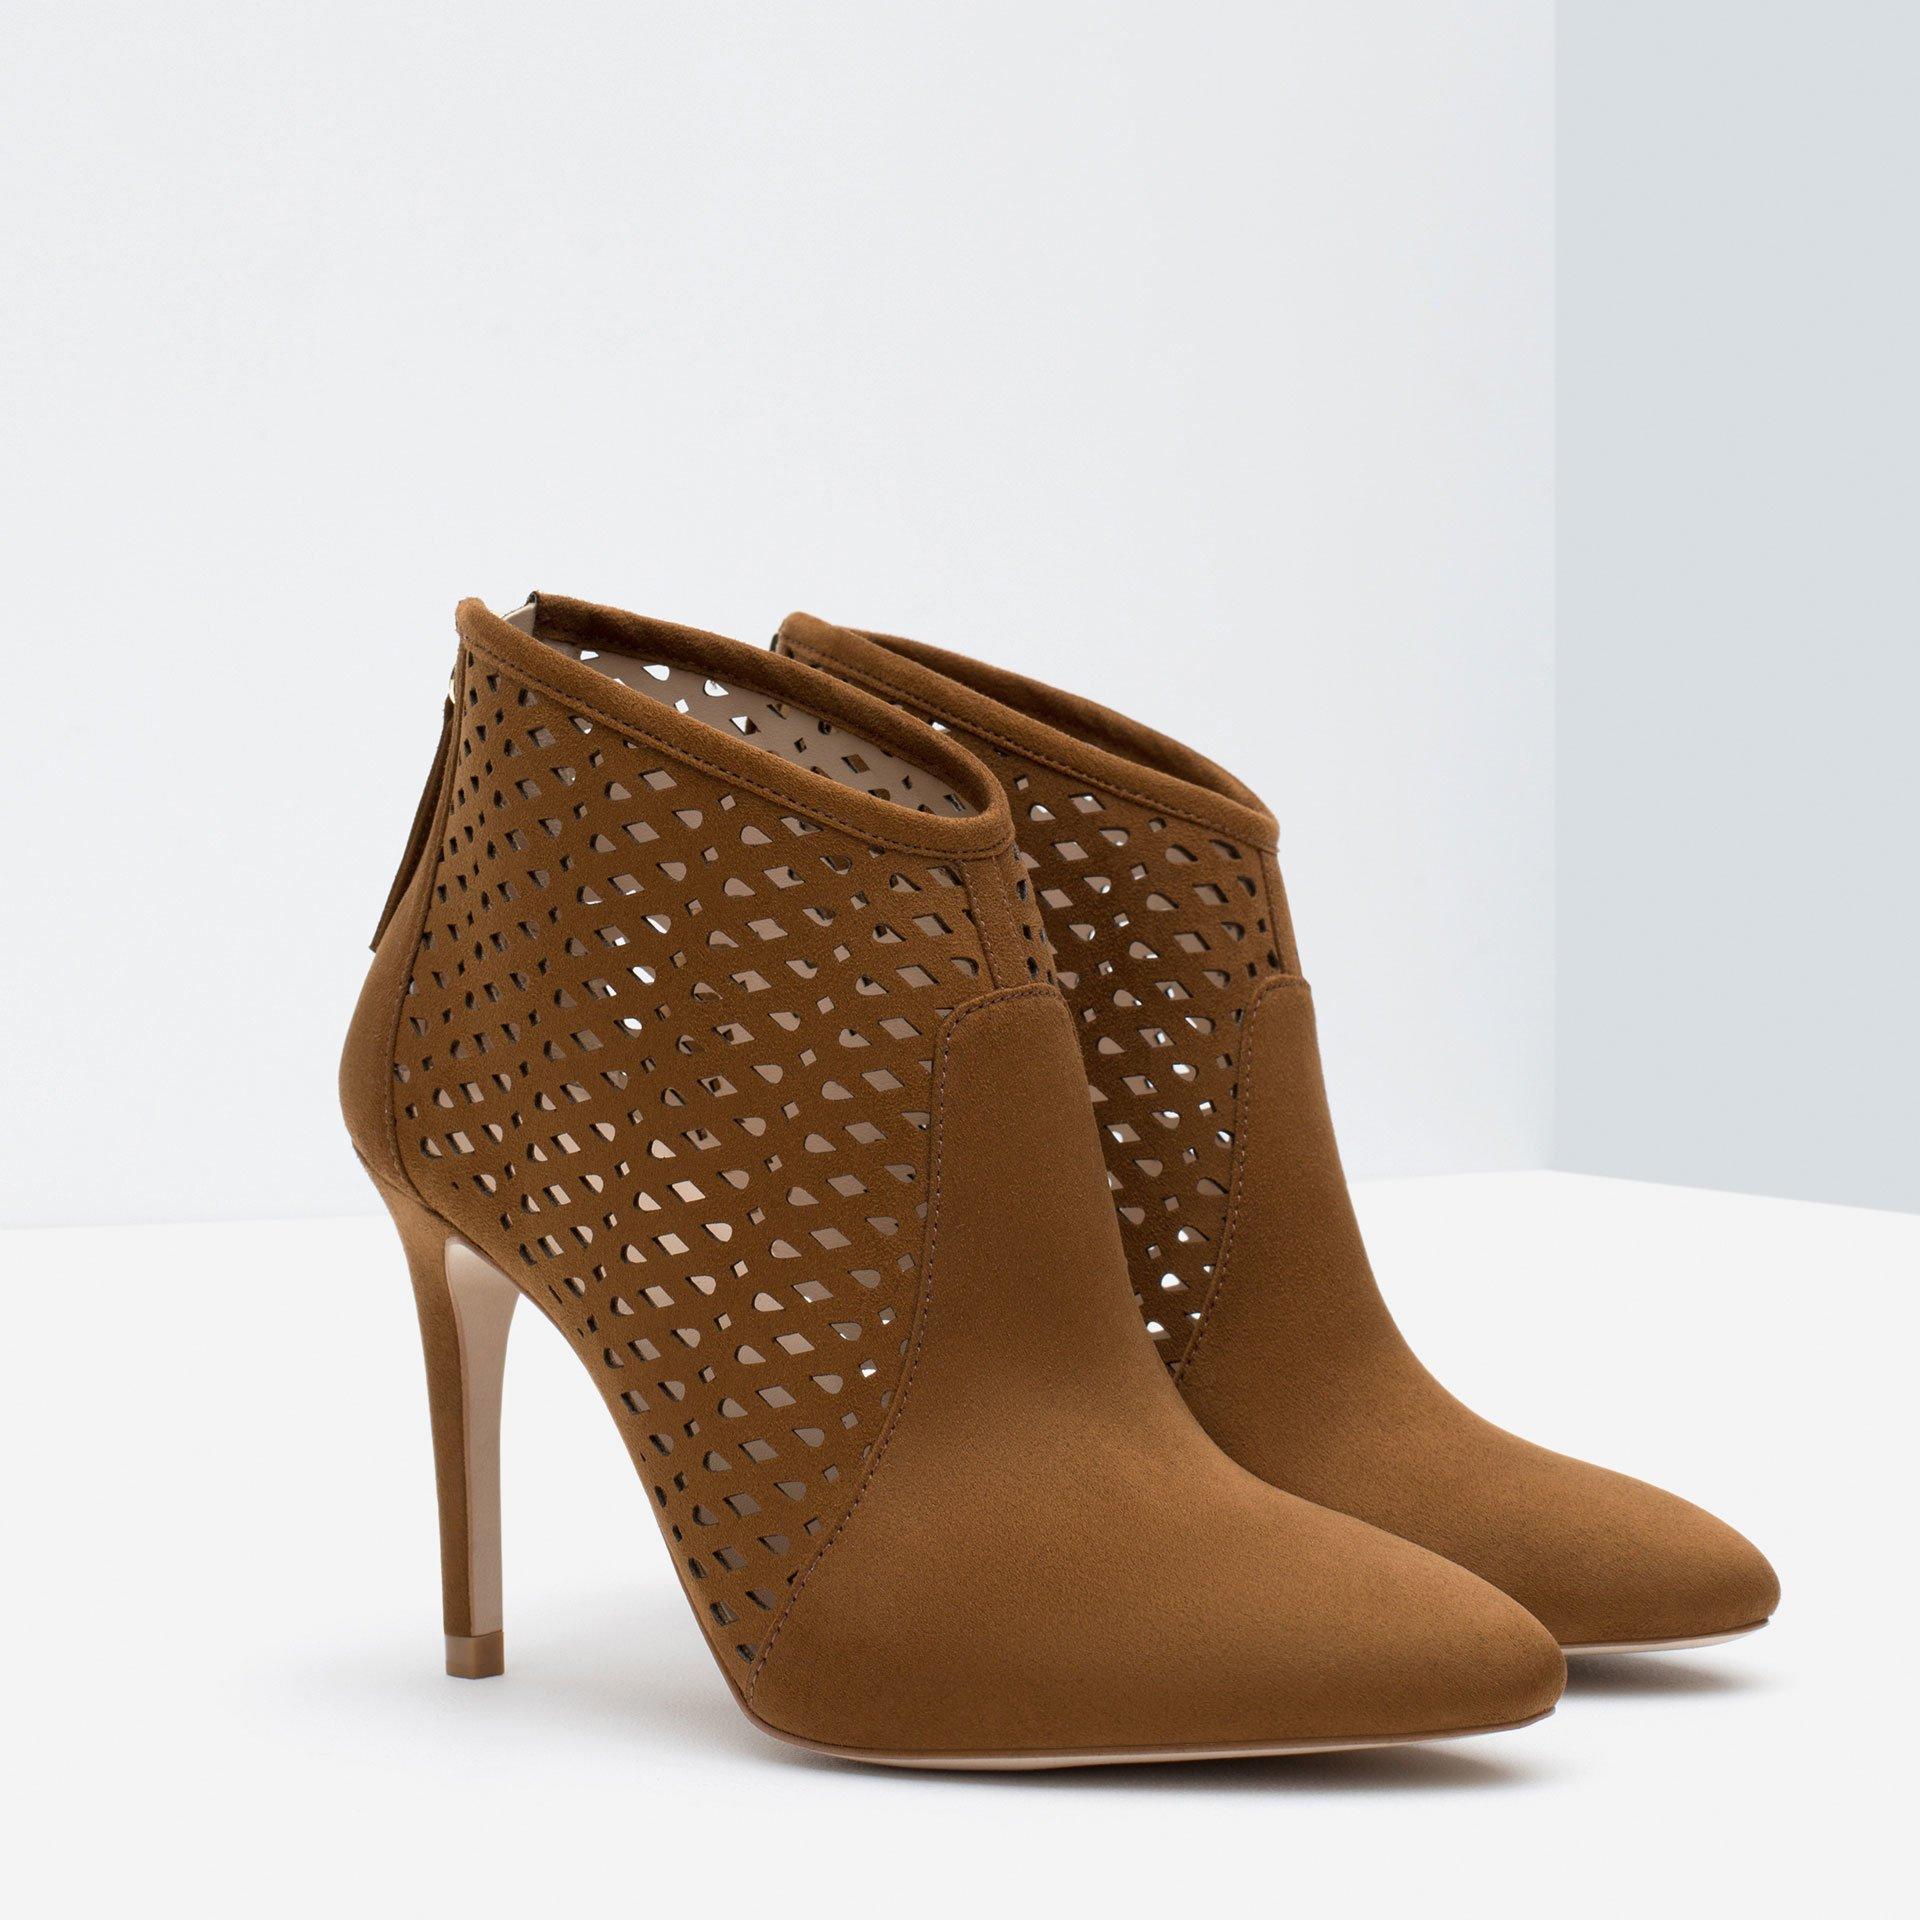 zara cut work high heel ankle boots in brown lyst